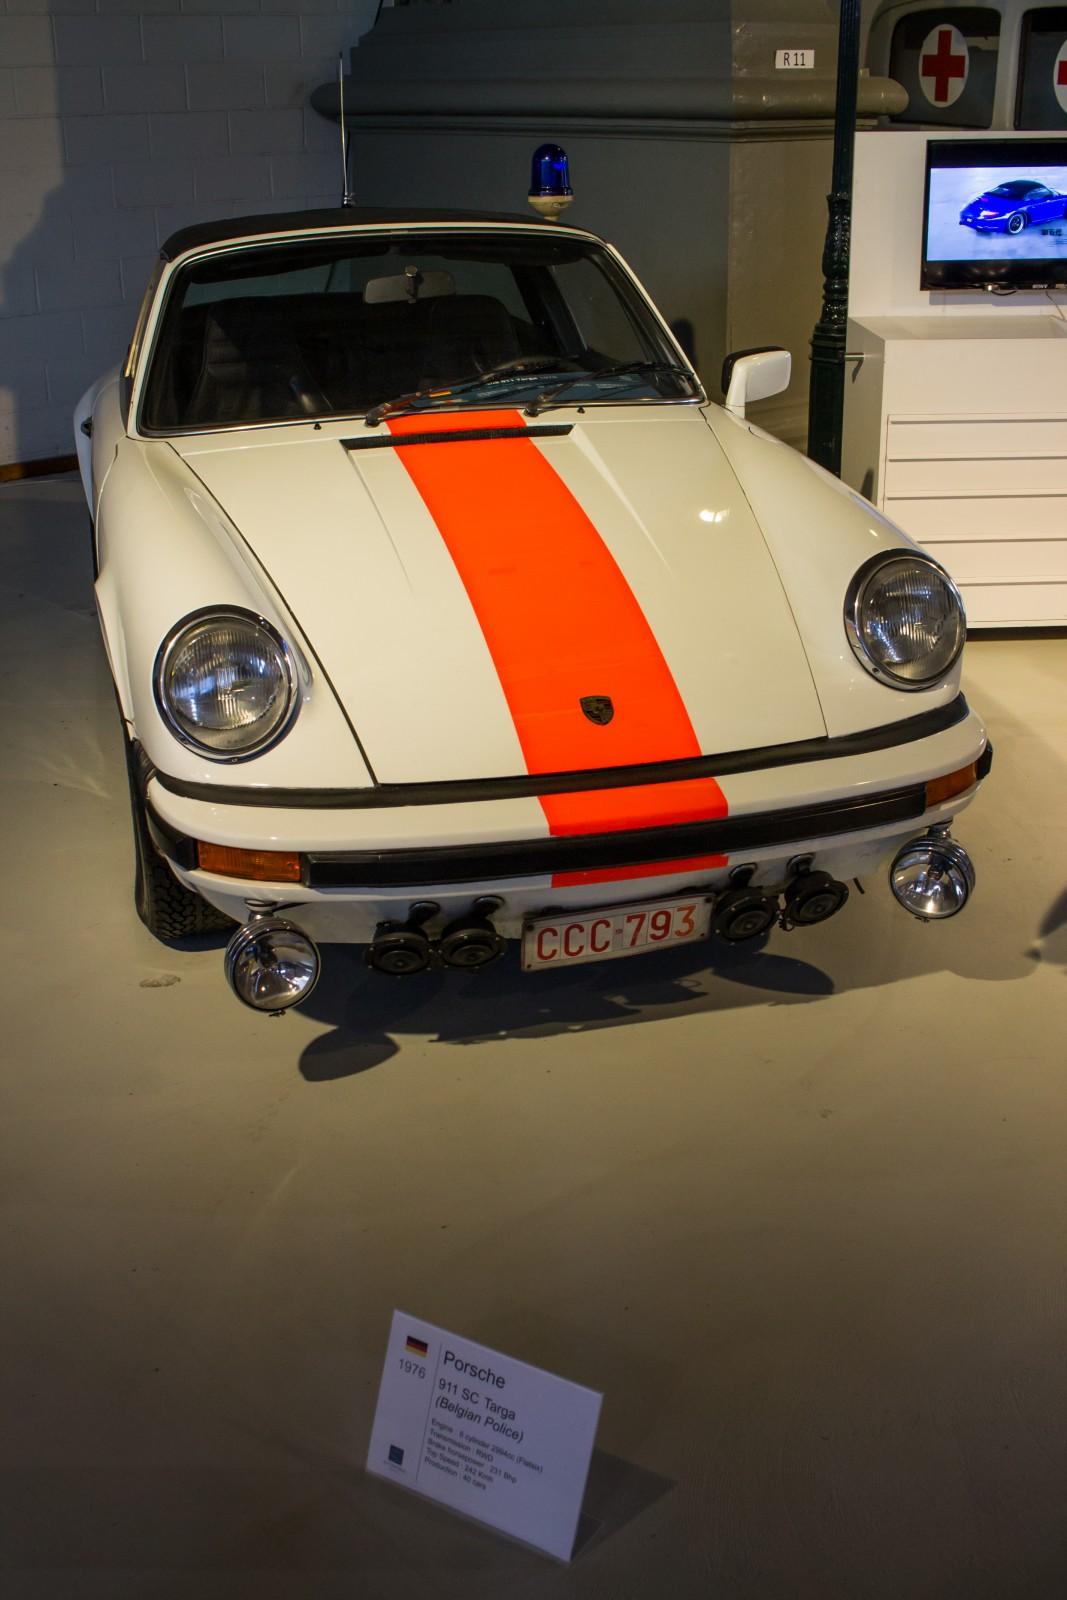 Belgian police Porsche displayed in the Autoworld Brussels